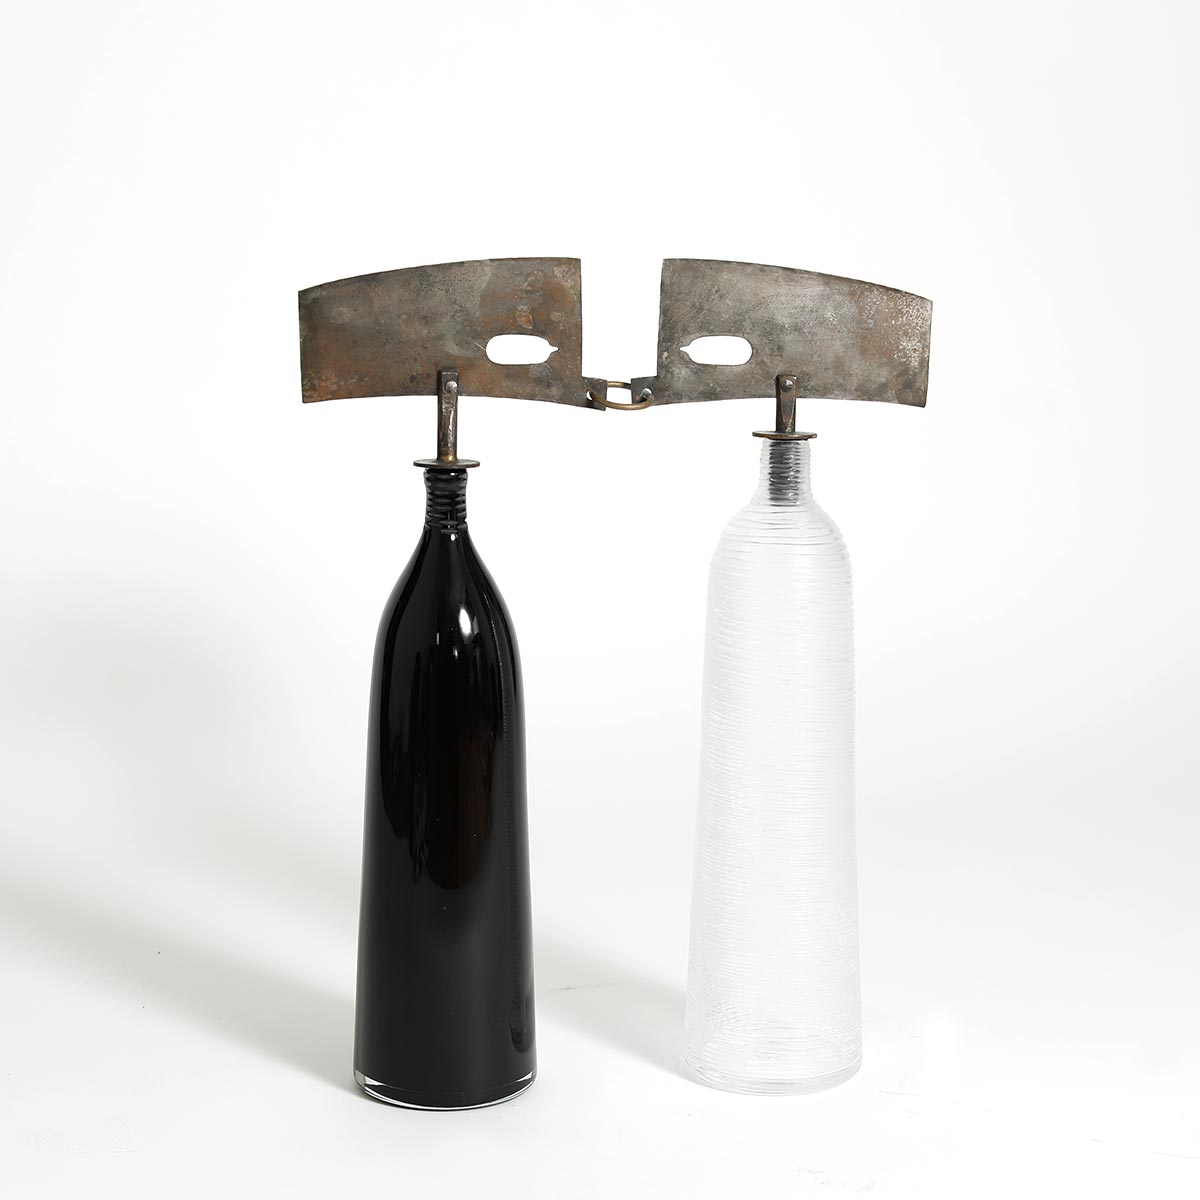 Galerie Insighter Paris by Vanessa Metayer presents Ghislène Jolivet